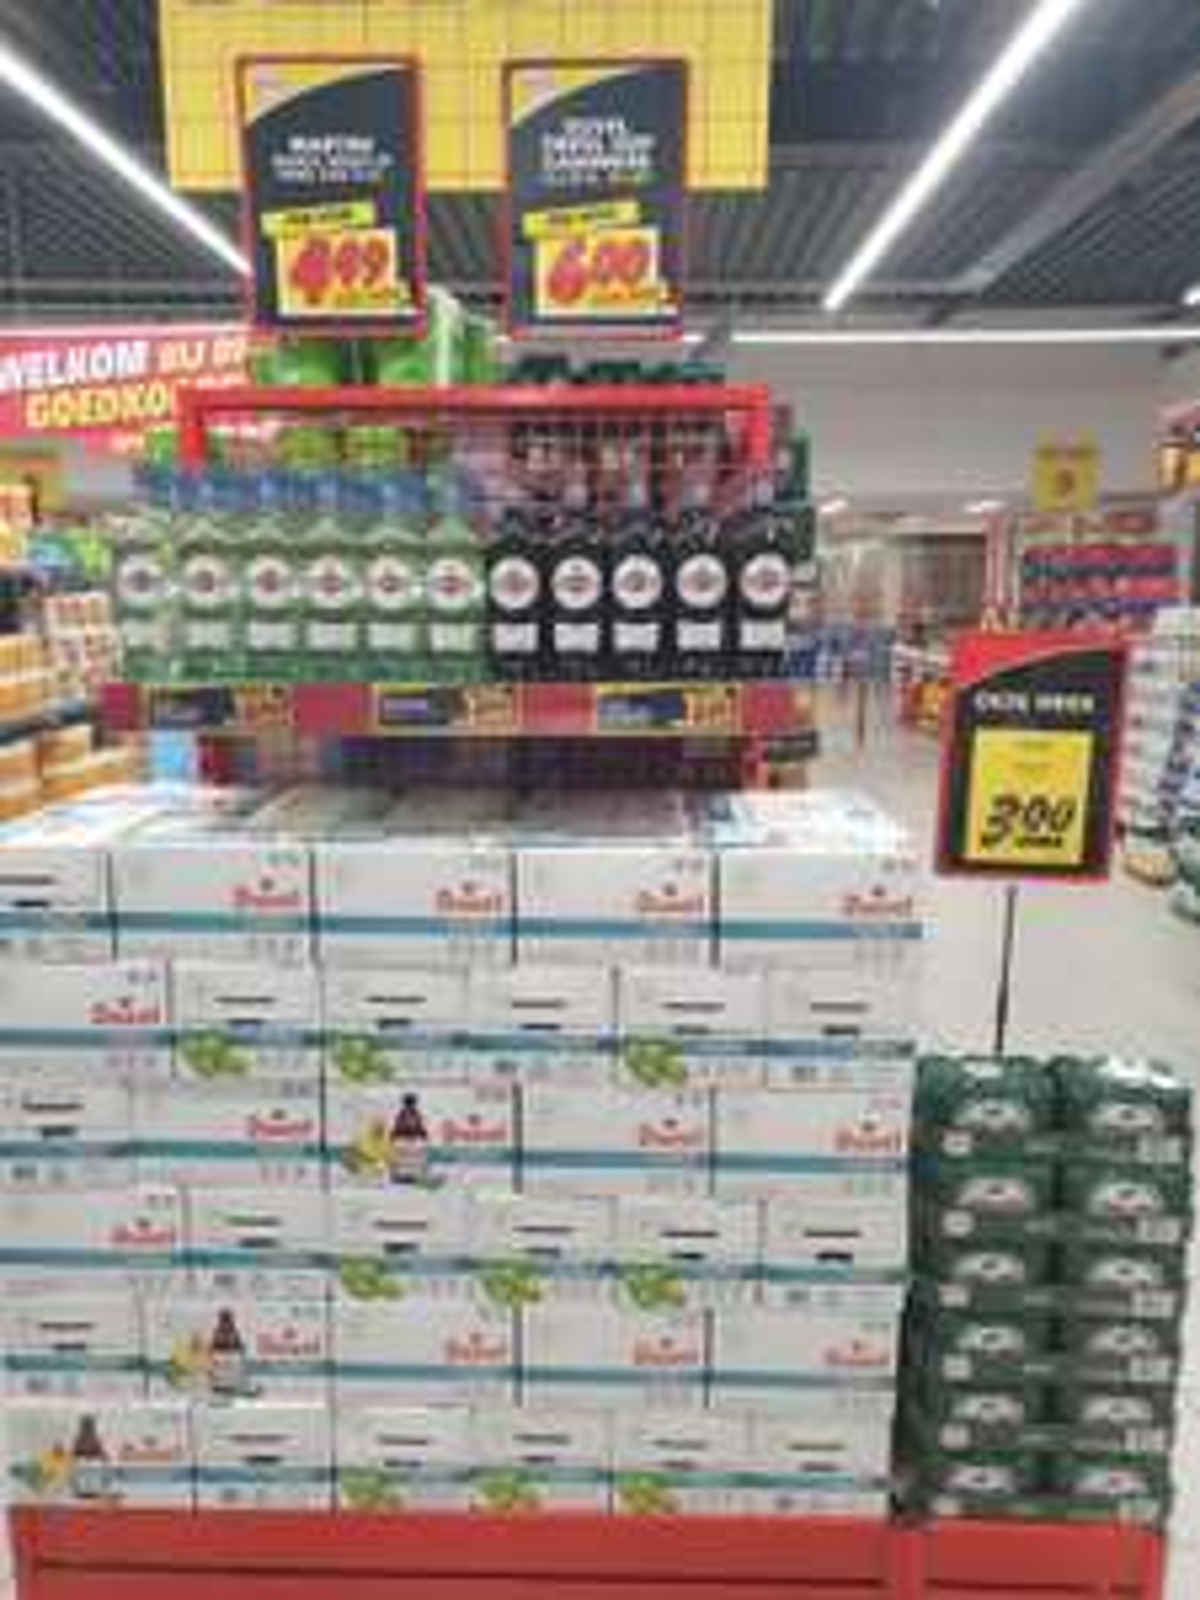 Duvel Tripel Hop Cashmere bier 12-pack bier @Nettorama